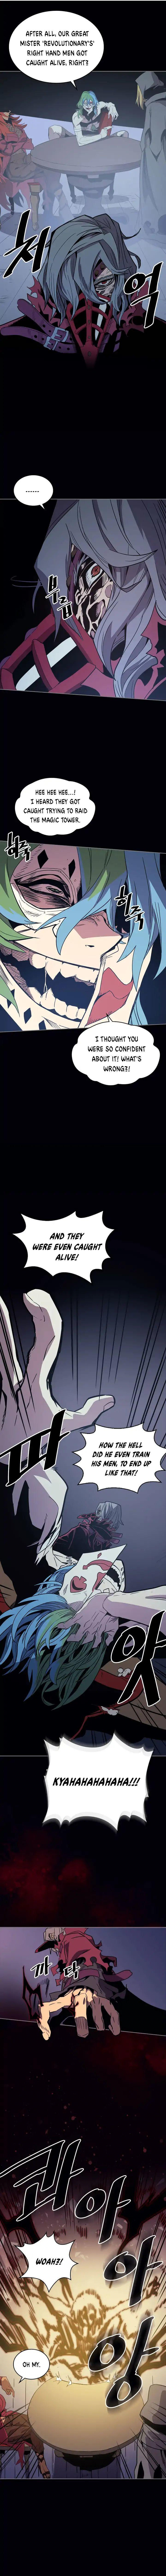 A Returner's Magic Should Be Special Chapter 74 page 3 - Mangakakalots.com